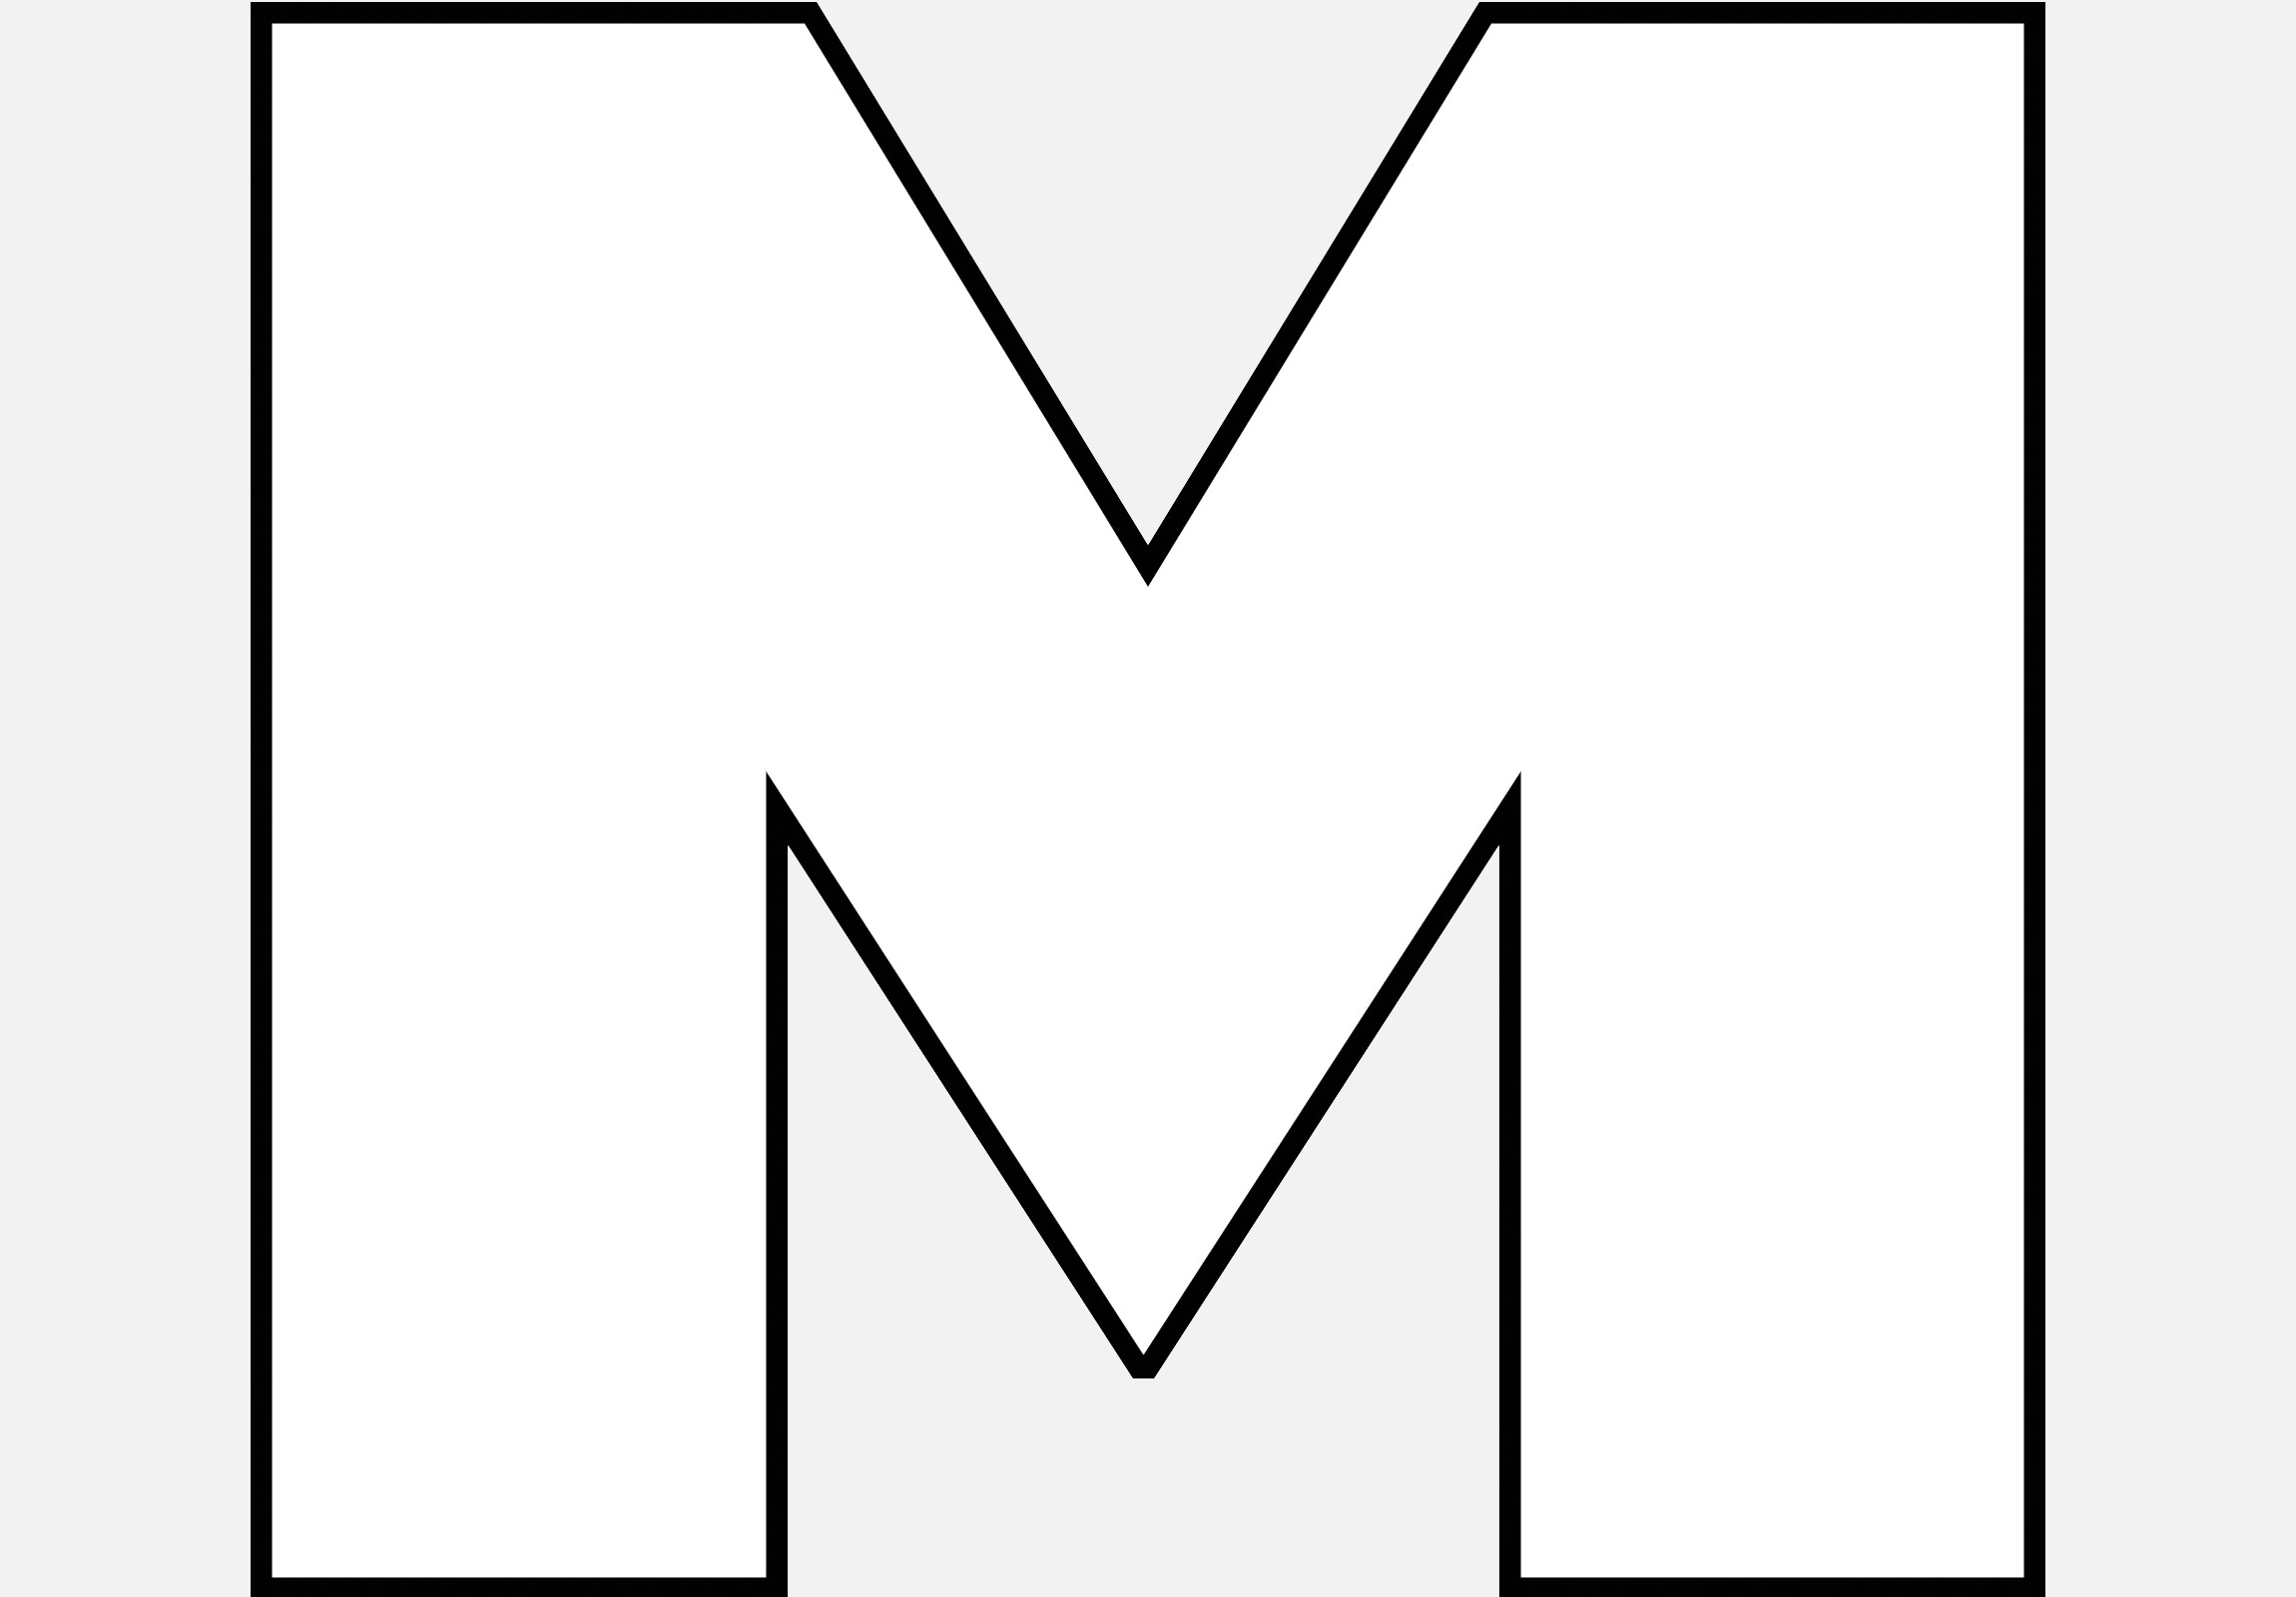 Beautiful M&m Baby Shower Theme Part – 7: Tenereze